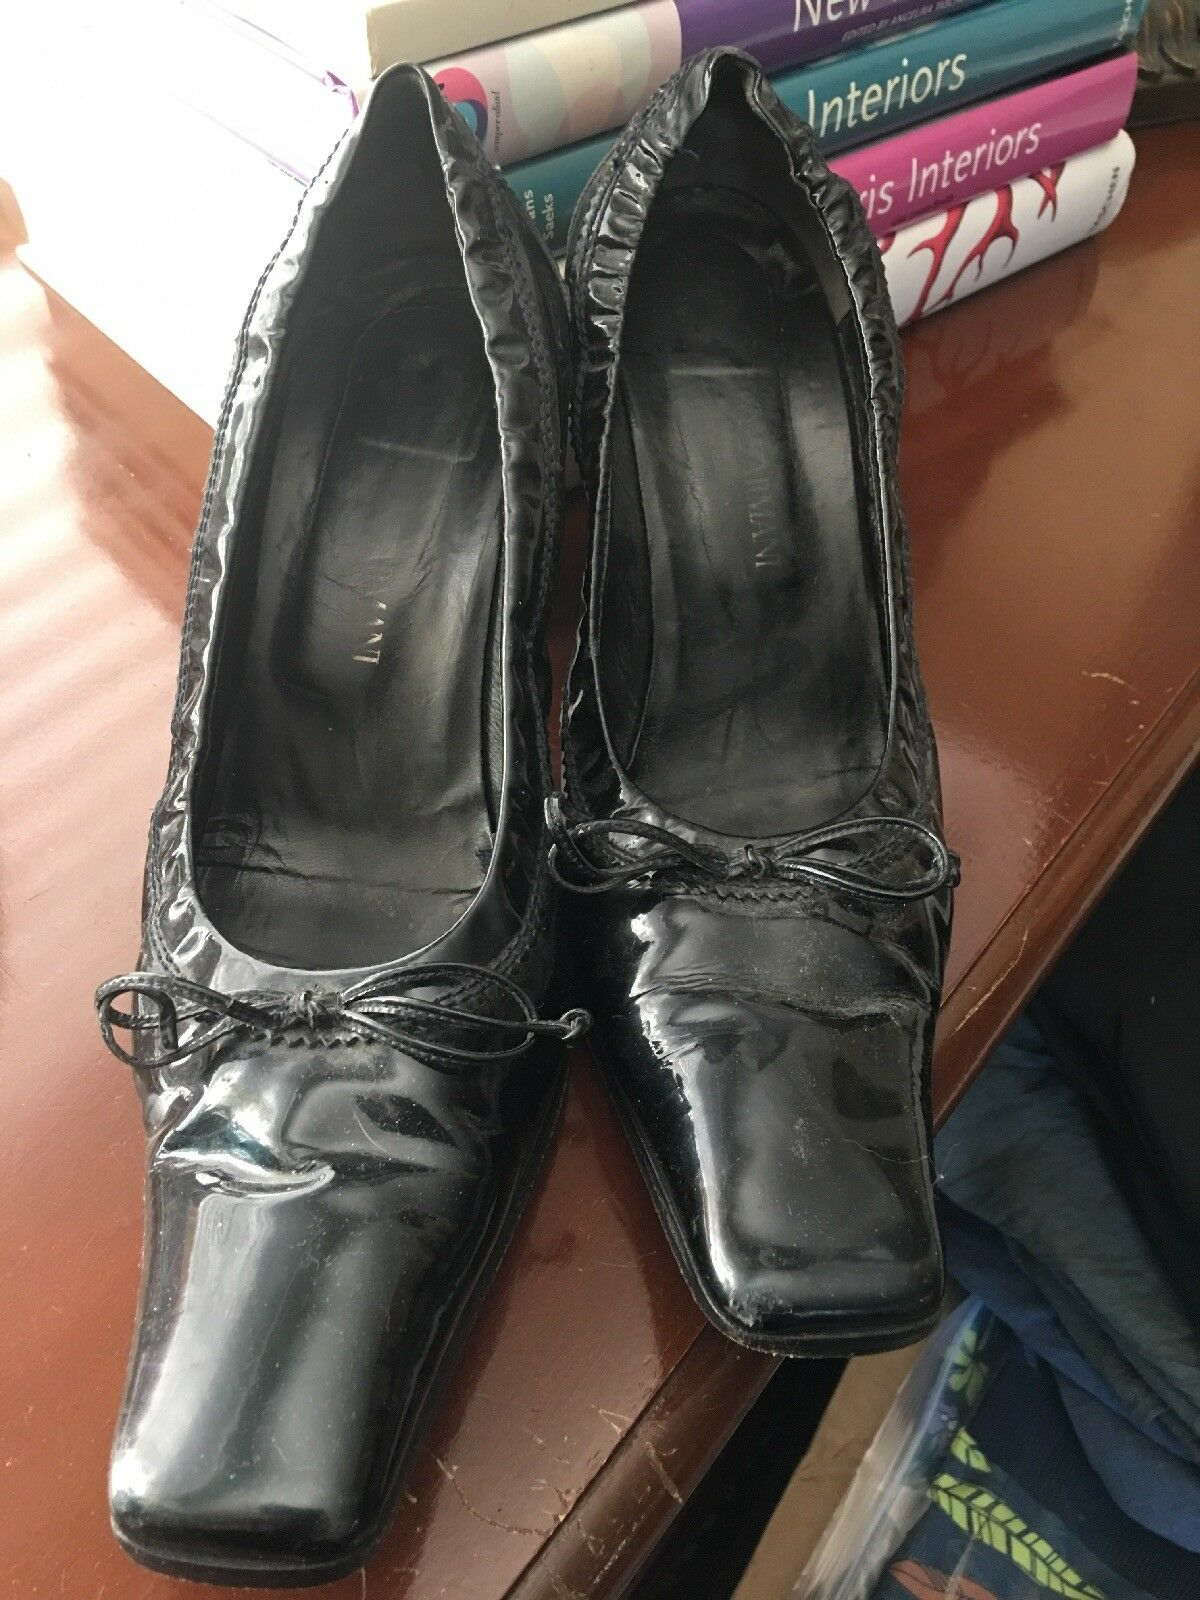 Vintage Giorgio Armani shoes 39.5 8.5 9 M Patent Leather Black Heels Pumps